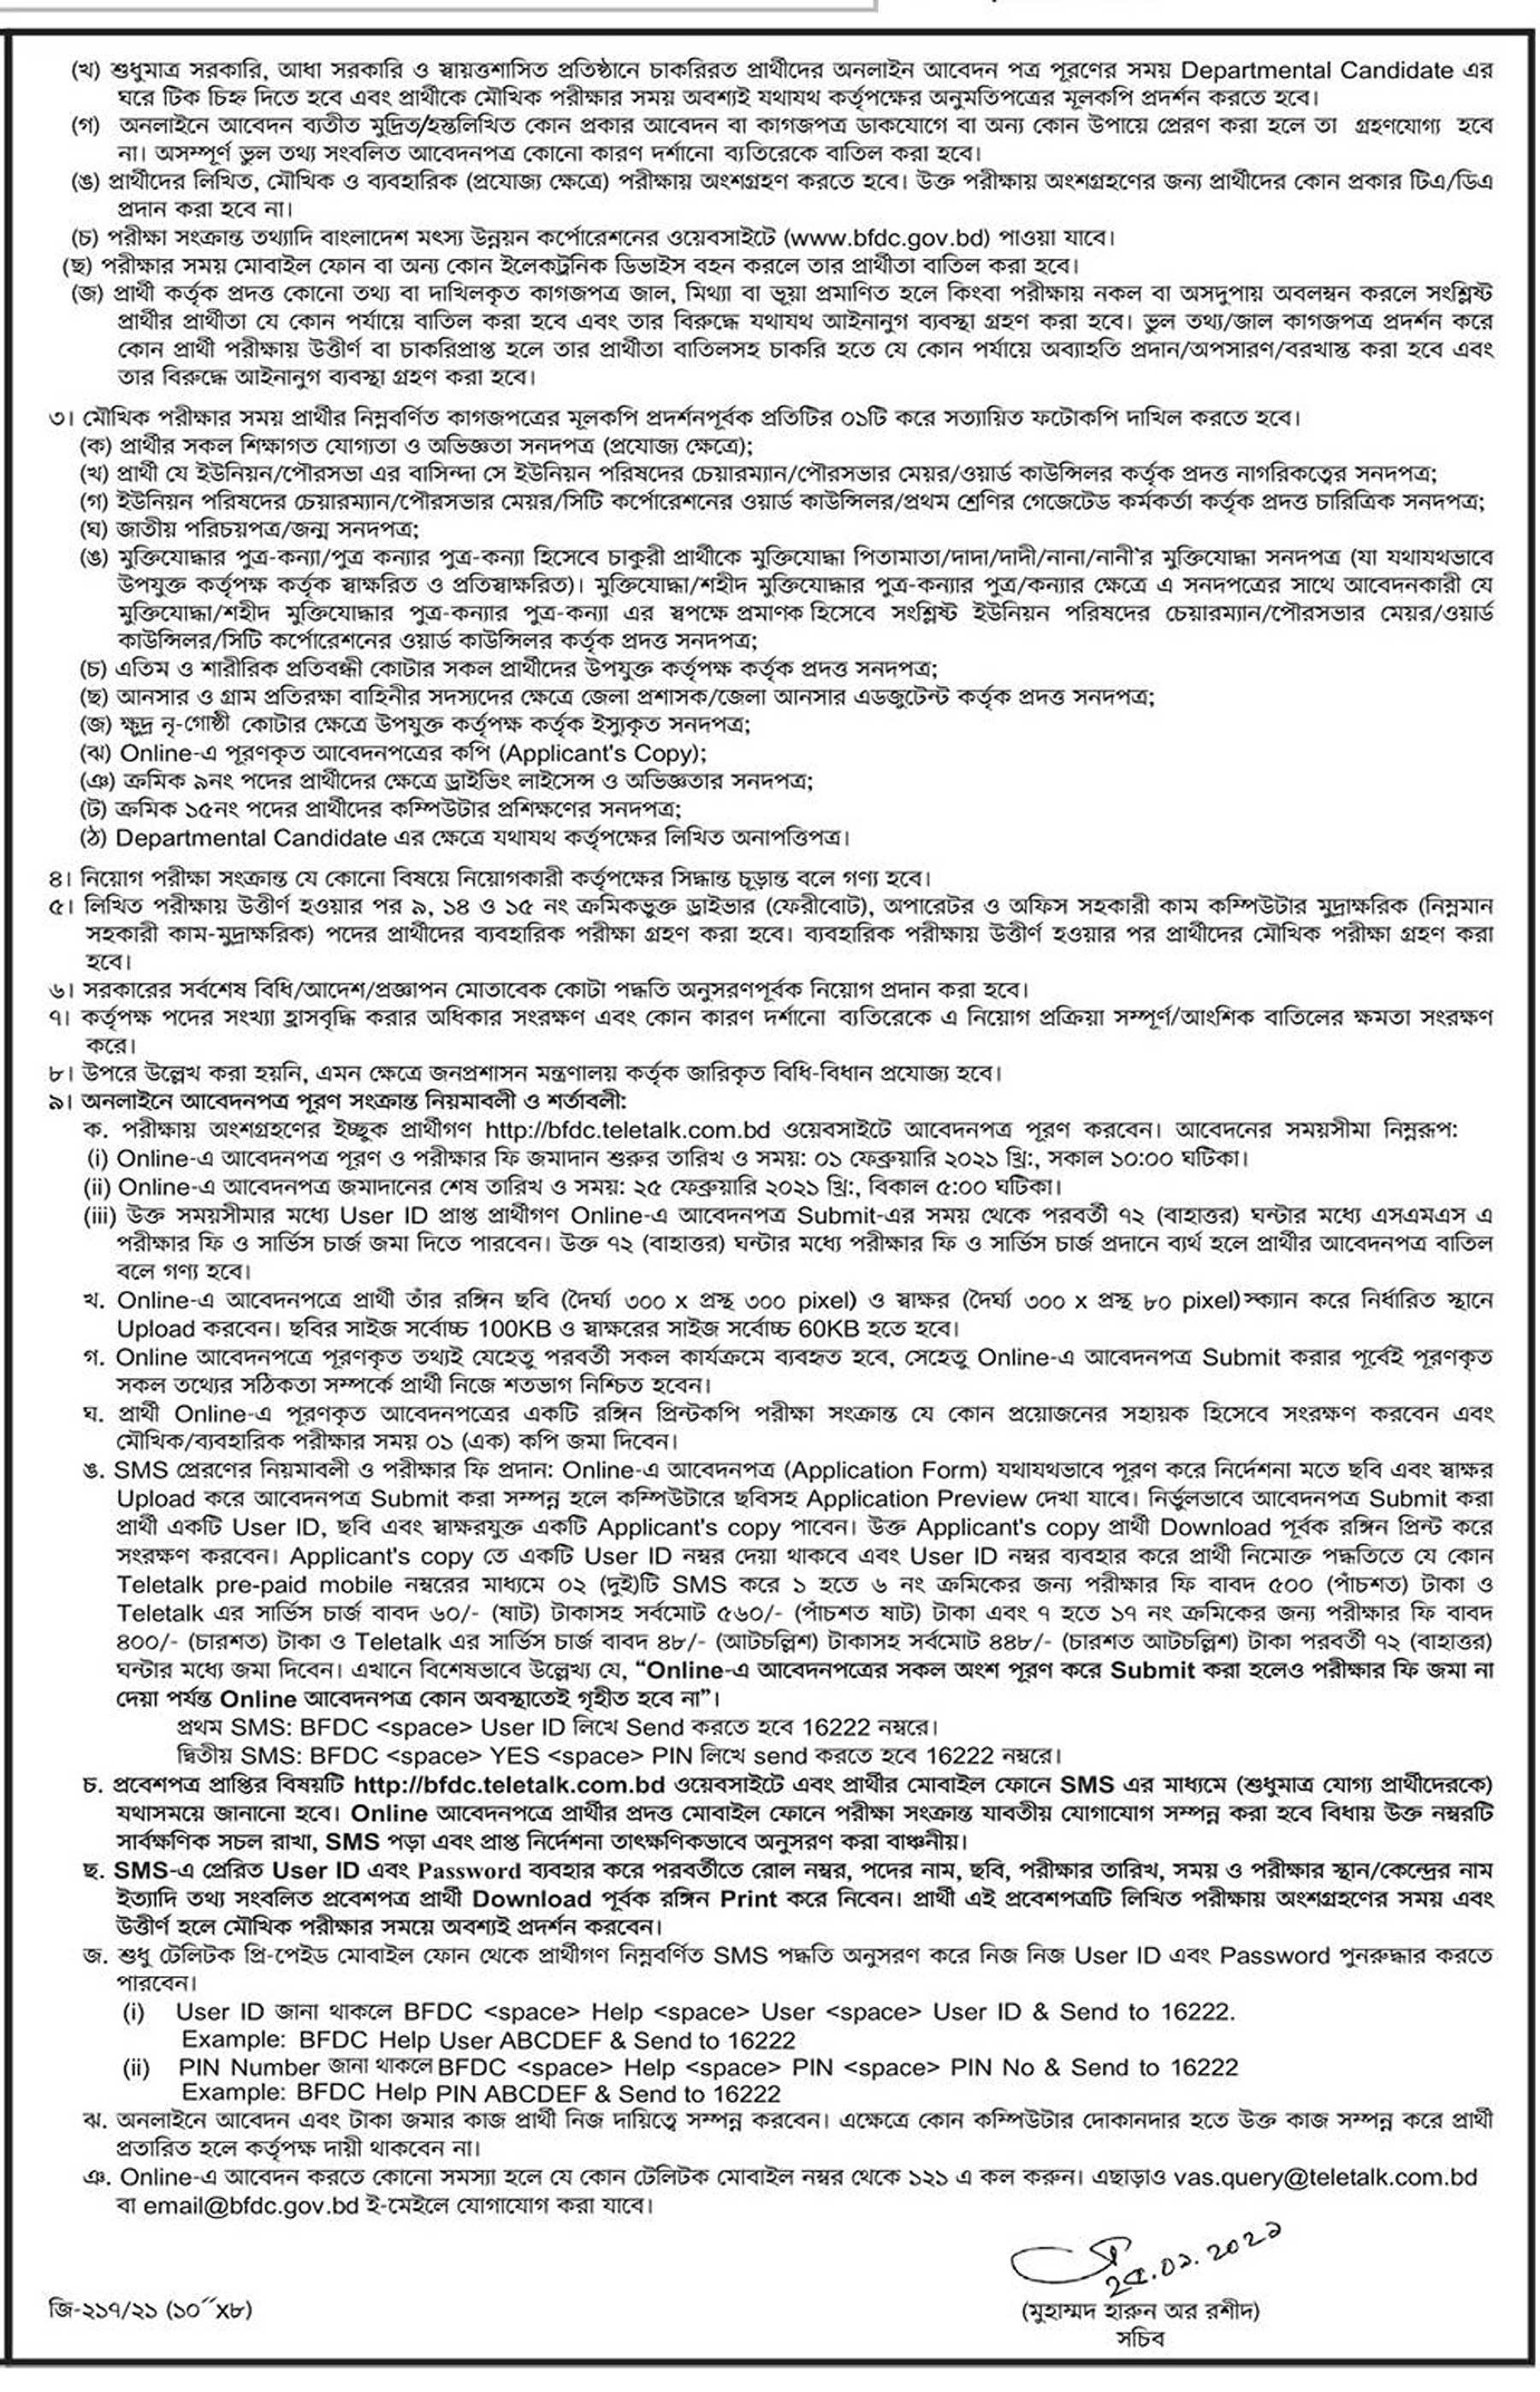 Bangladesh Fisheries Development Corporation BFDC Job Circular